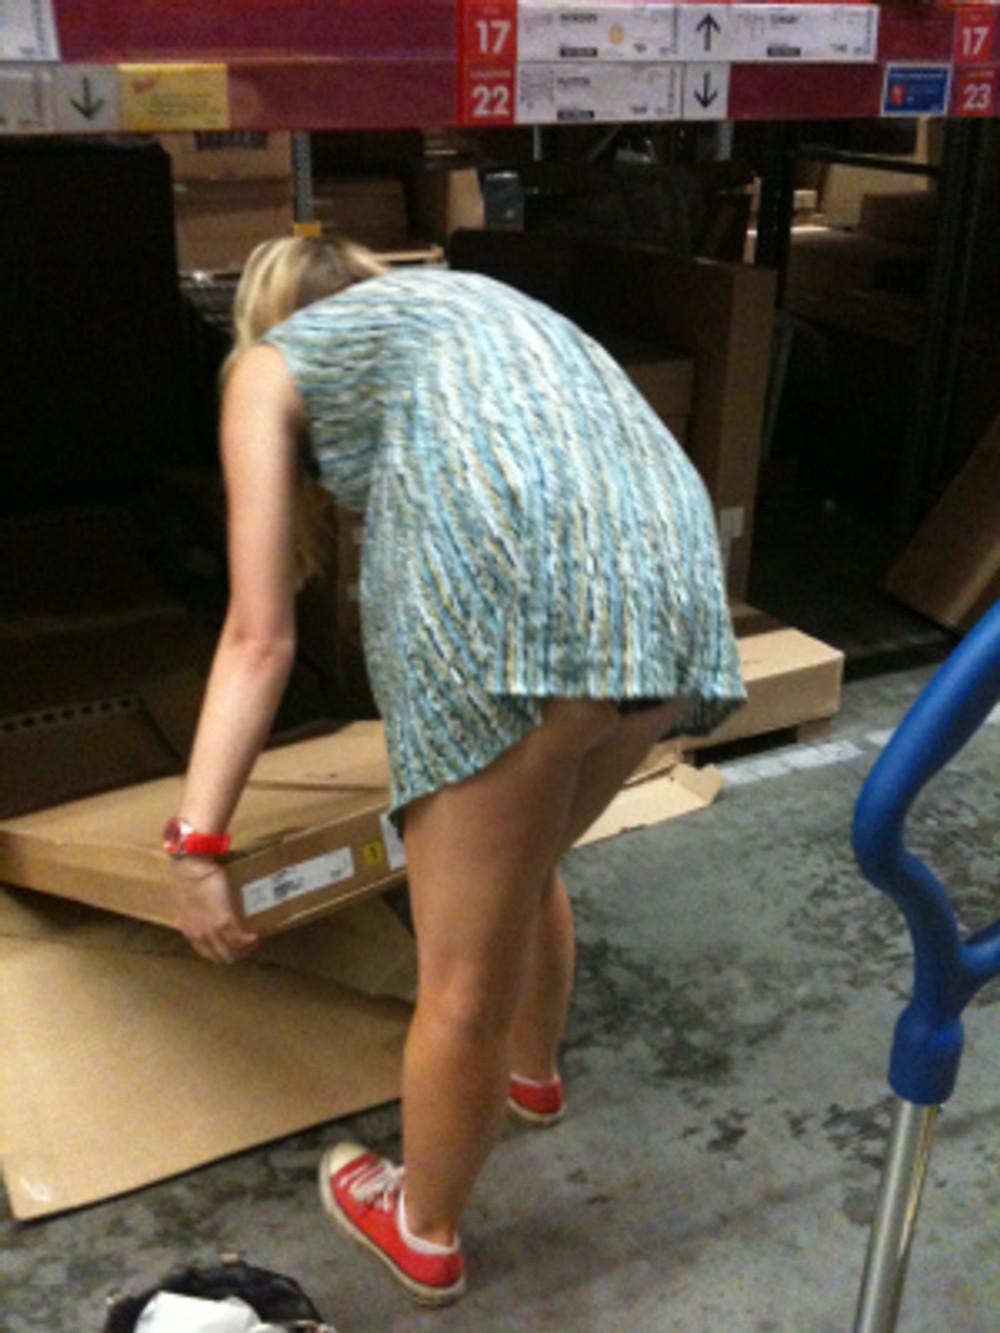 Nerd Child's Bridget Jones Moment at Ikea